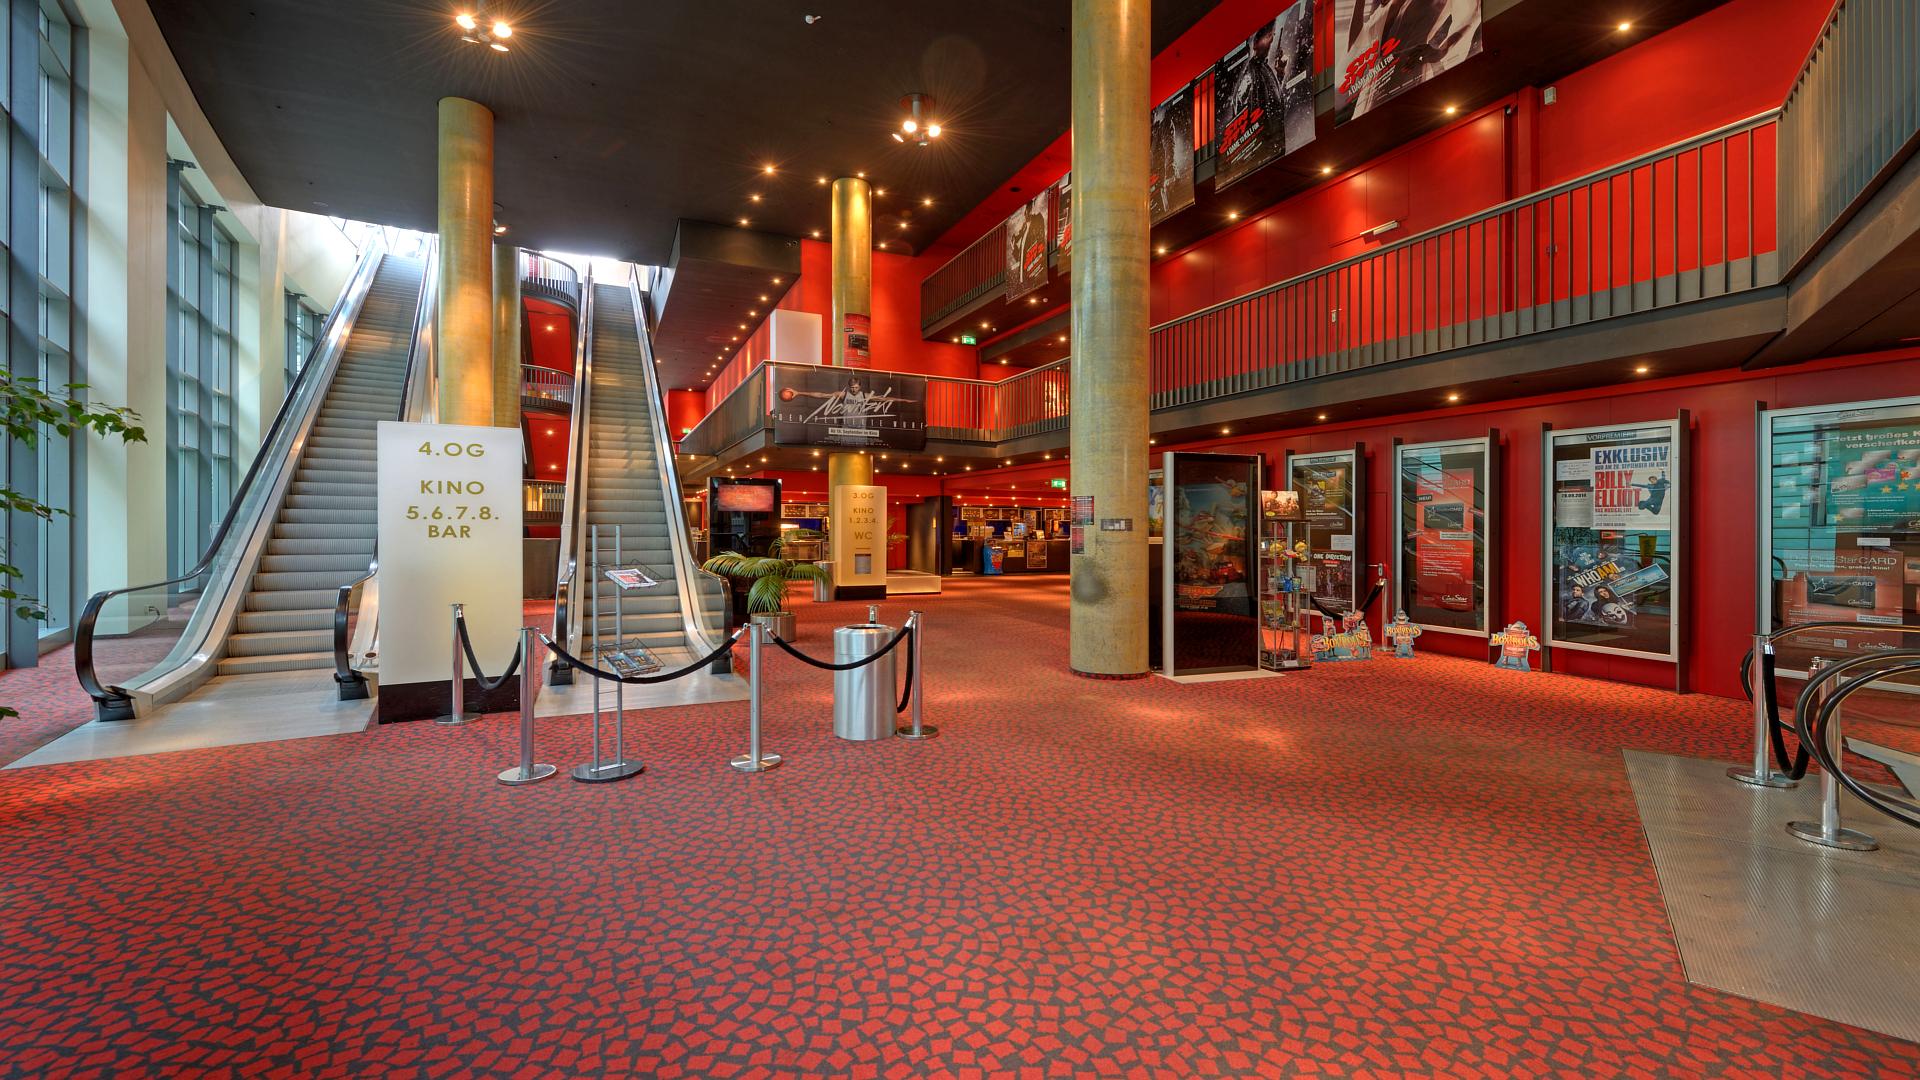 Leipzig Cinestar